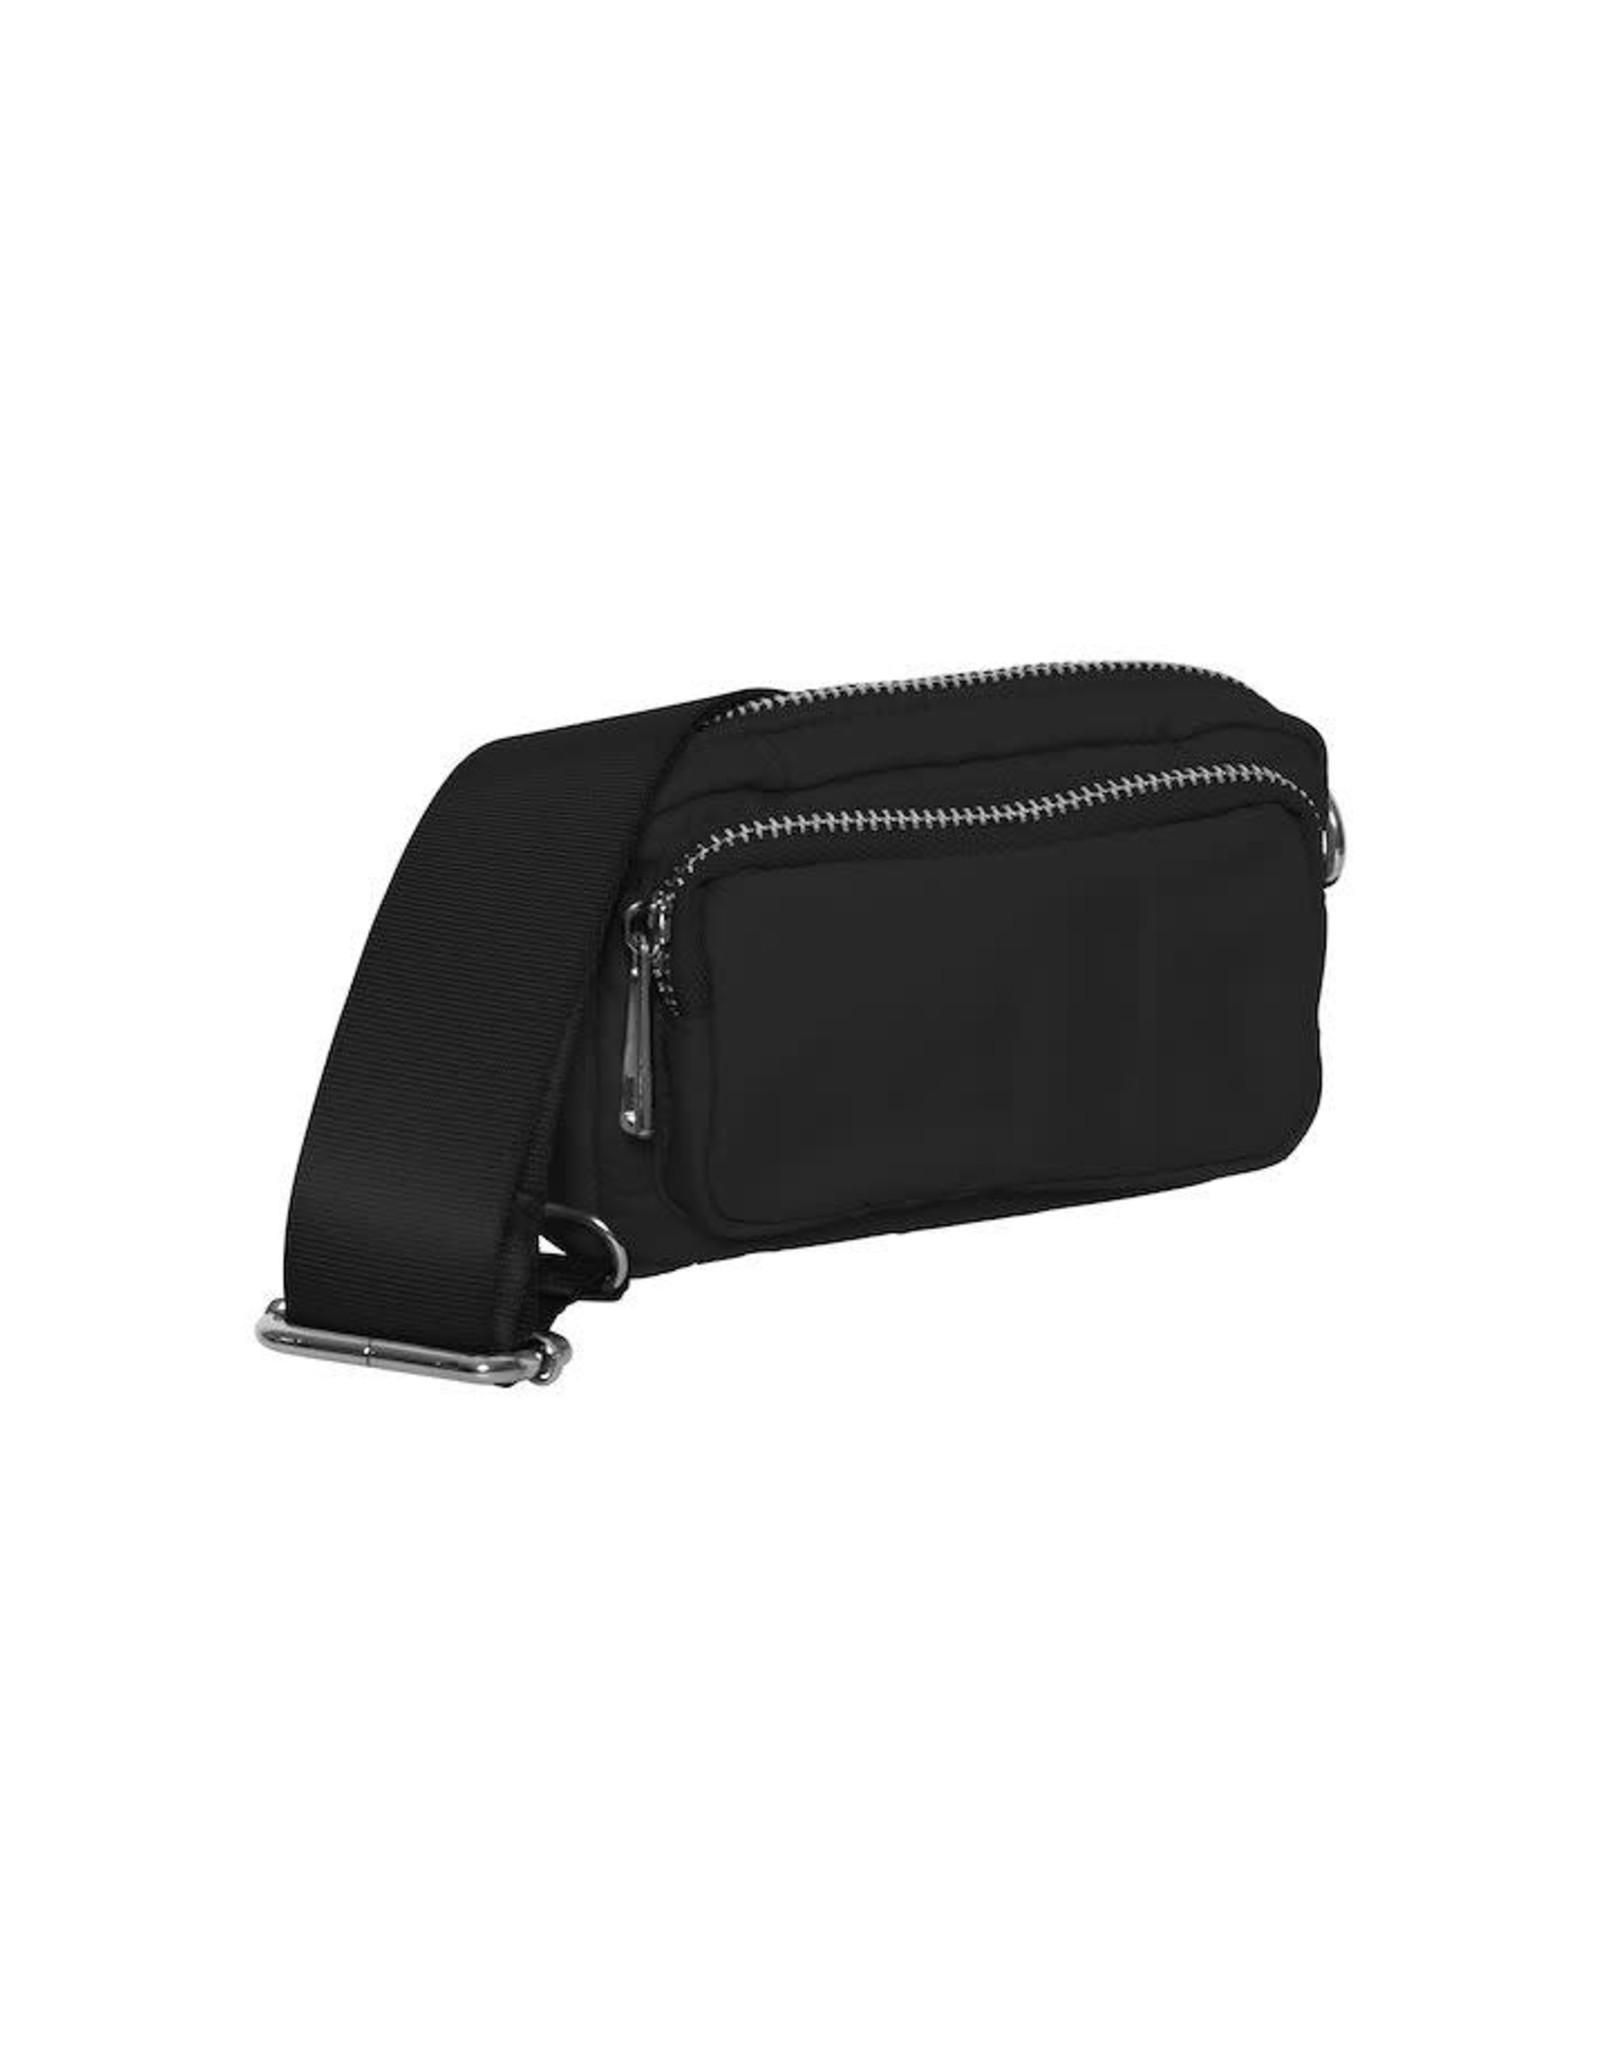 ICHI ICHI - Furna hip bag